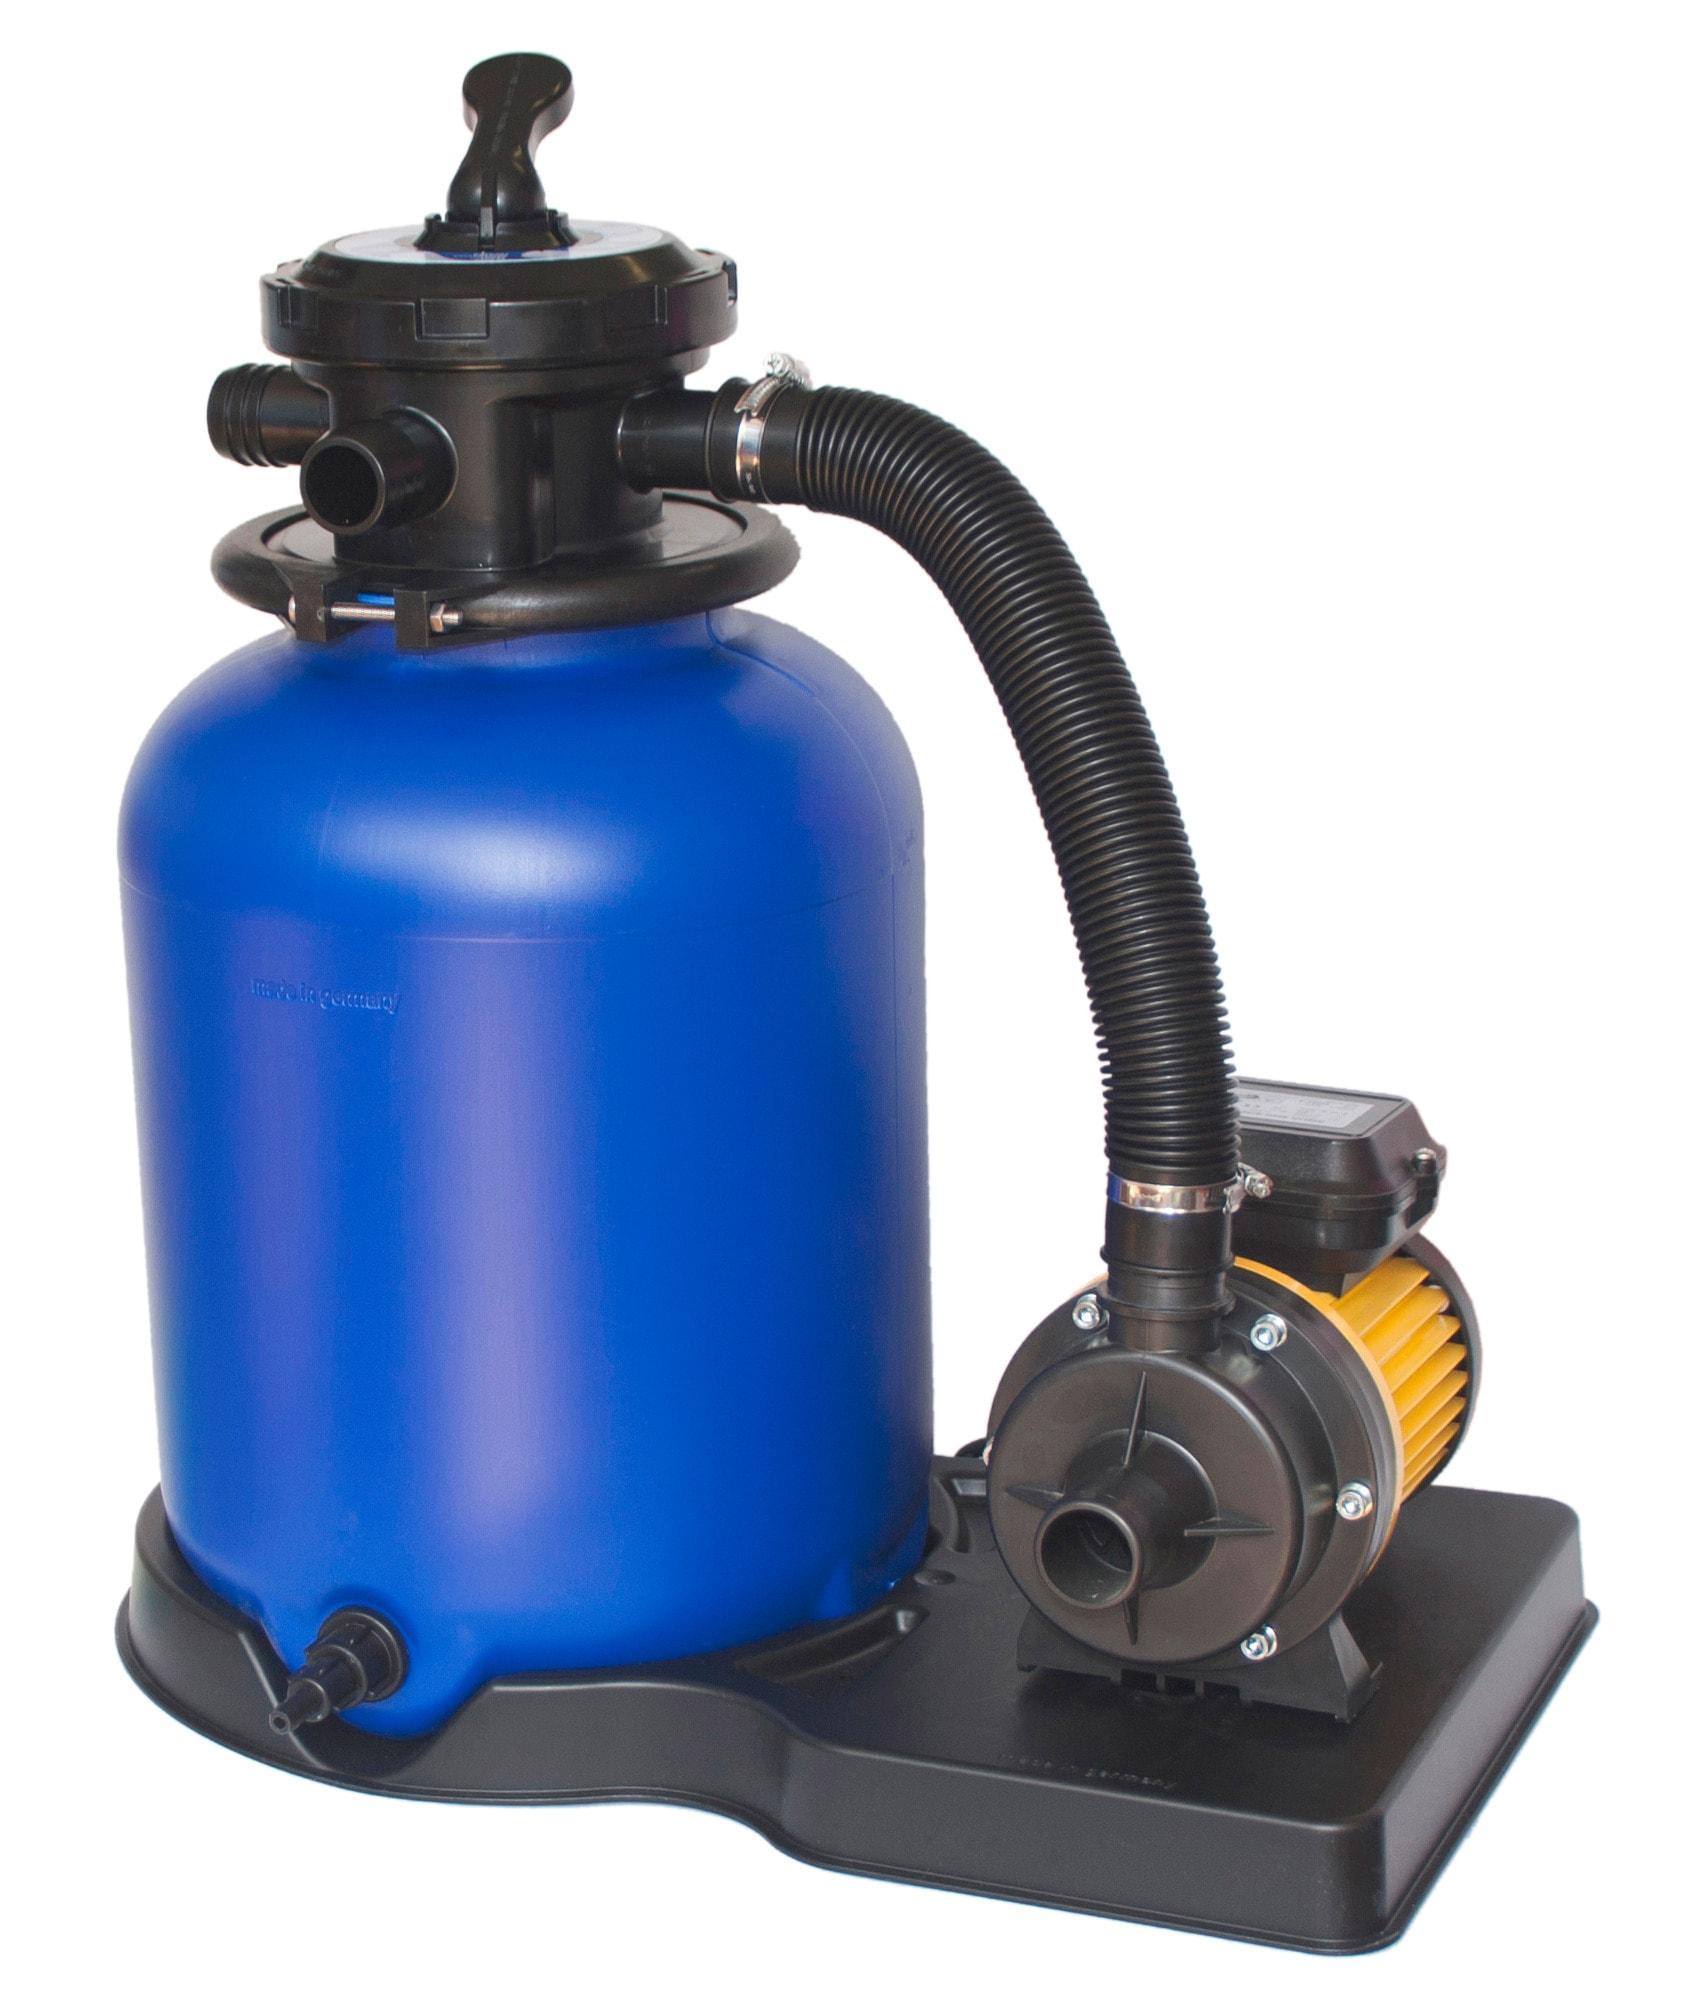 CLEAR POOL Sandfilteranlage »Sandfilteranlage CP2503, 3 m³/h« | Garten > Swimmingpools > Filteranlagen | Blau | Kunststoff | CLEAR POOL